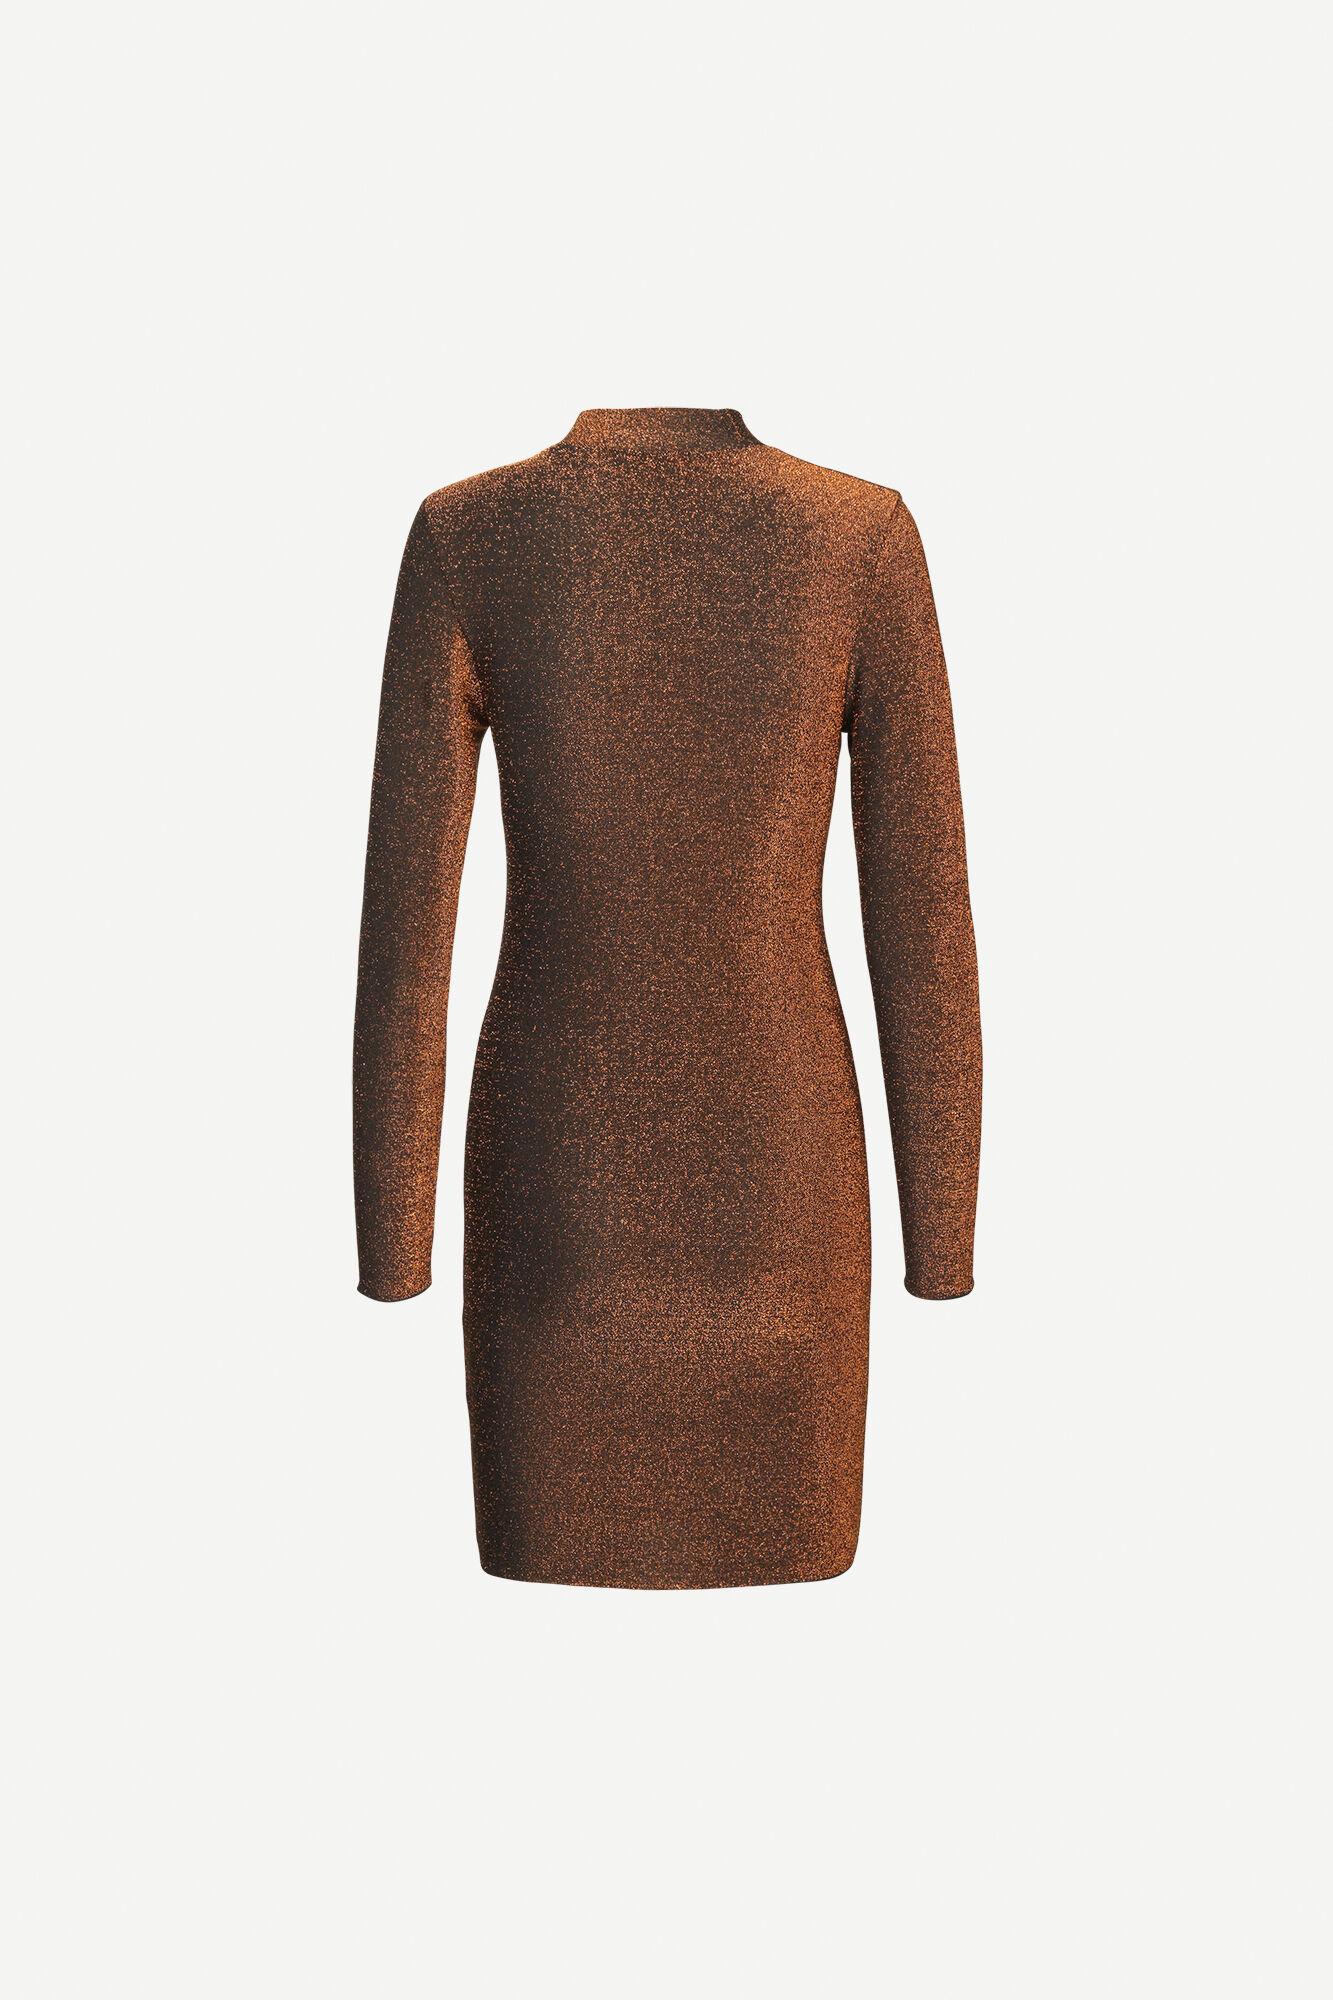 Jennie o-n dress 9559